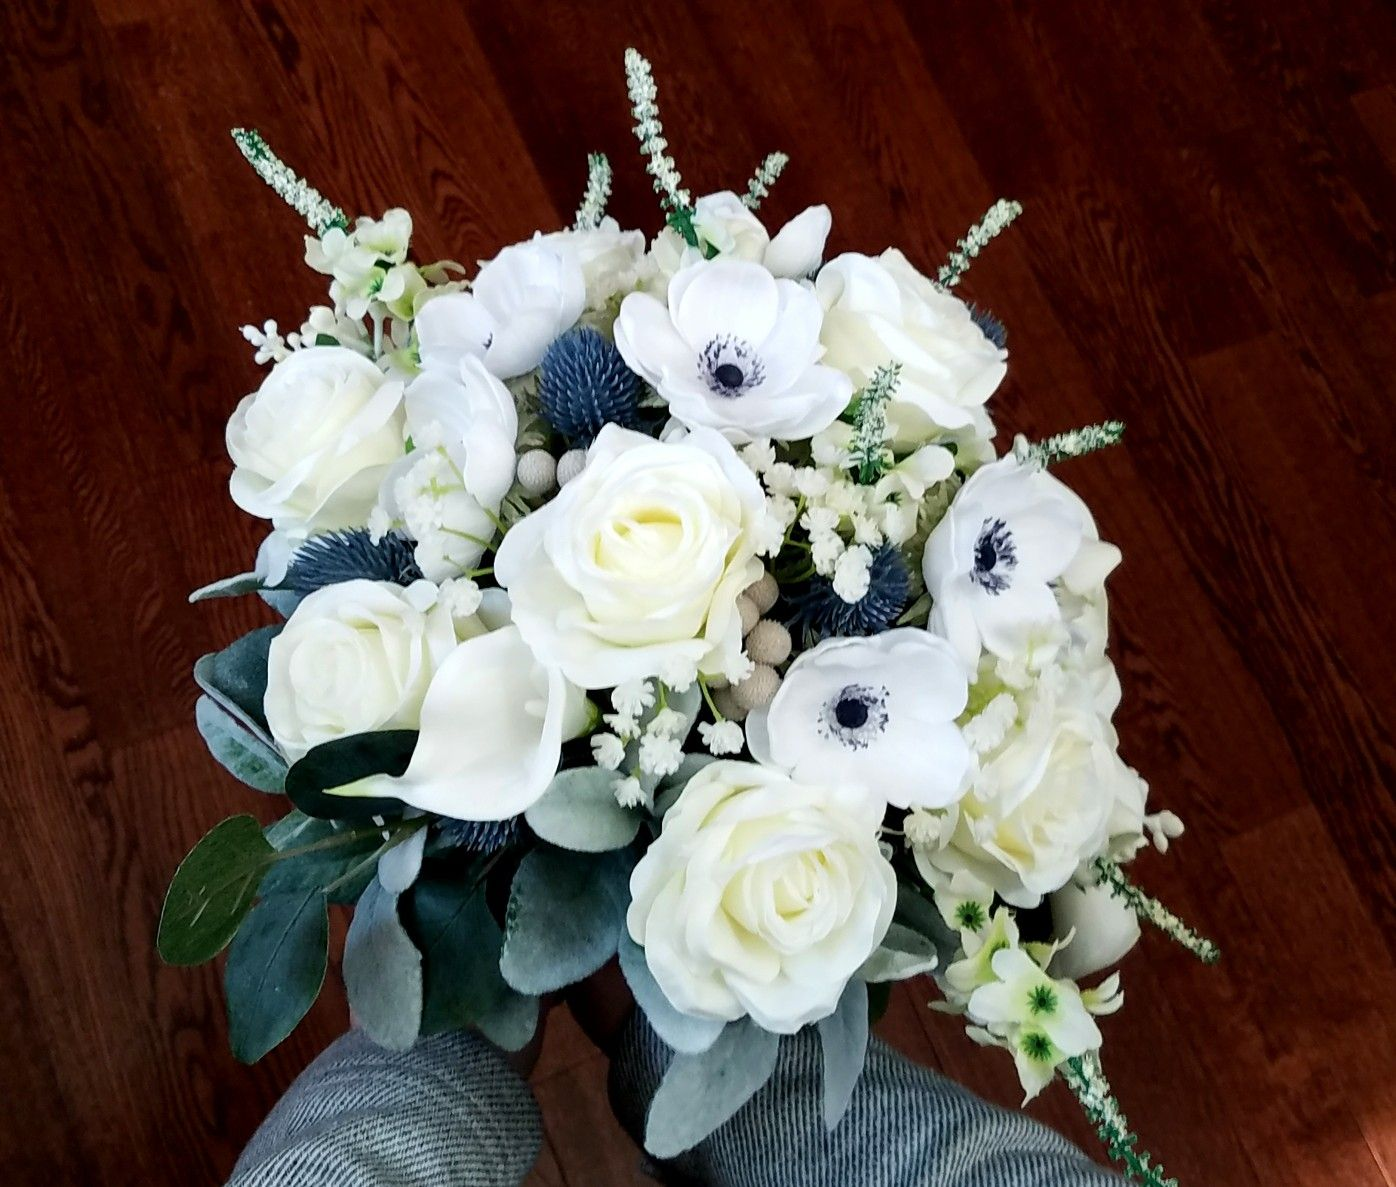 Gorgeous Cascading Bridal Bouquet Contact Chicago Silk Florist To